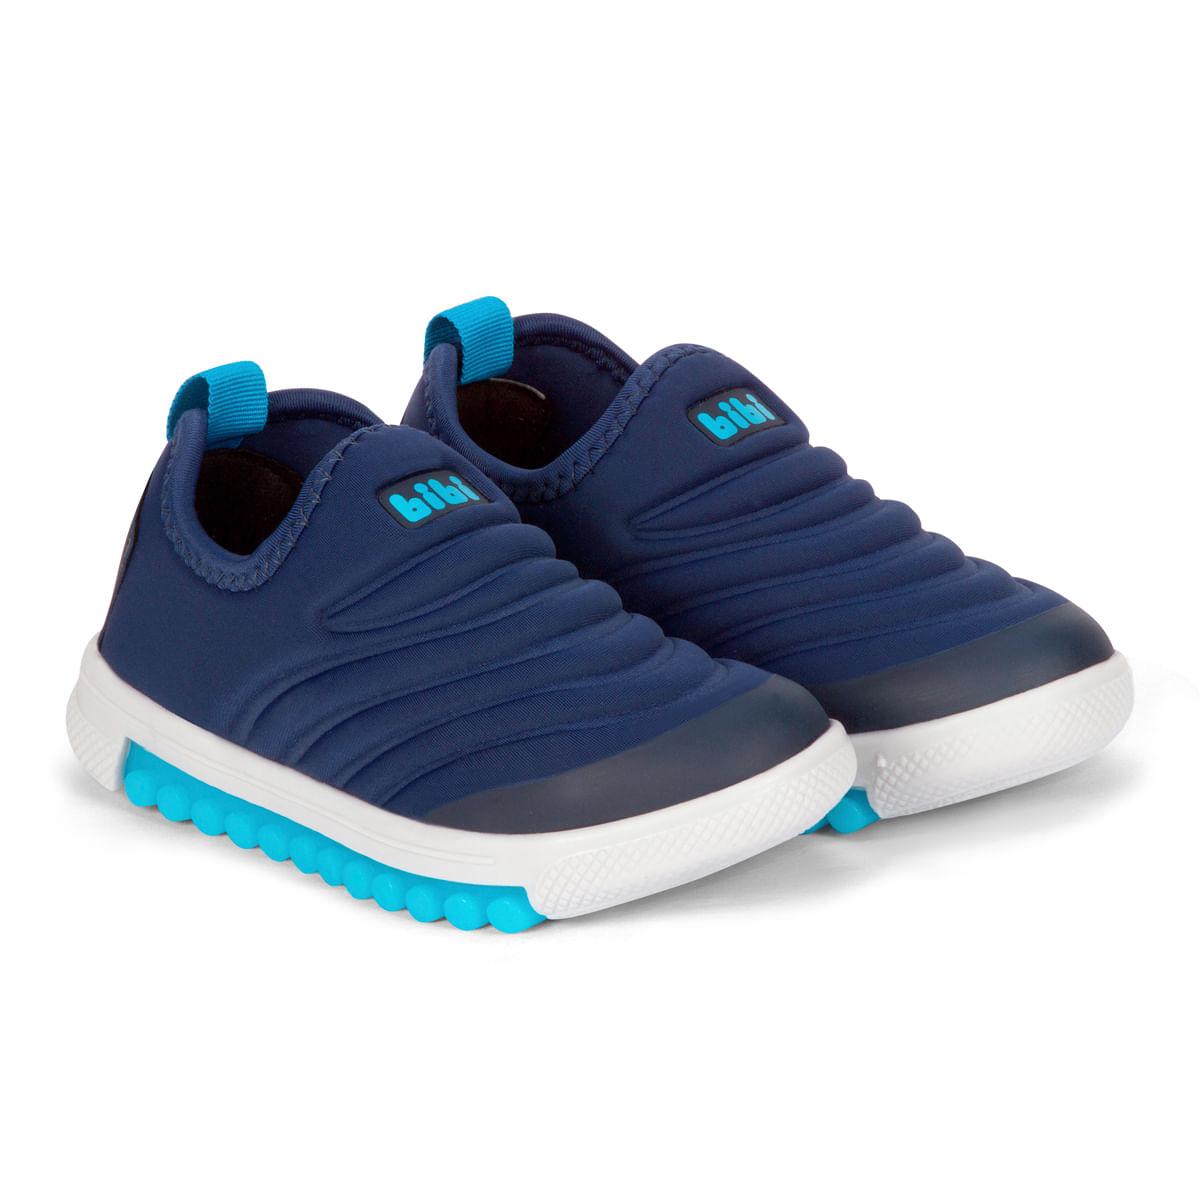 7bb1f4a6661 Tênis Infantil Masculino Bibi Azul Roller New 679463 - Bibi Calçados